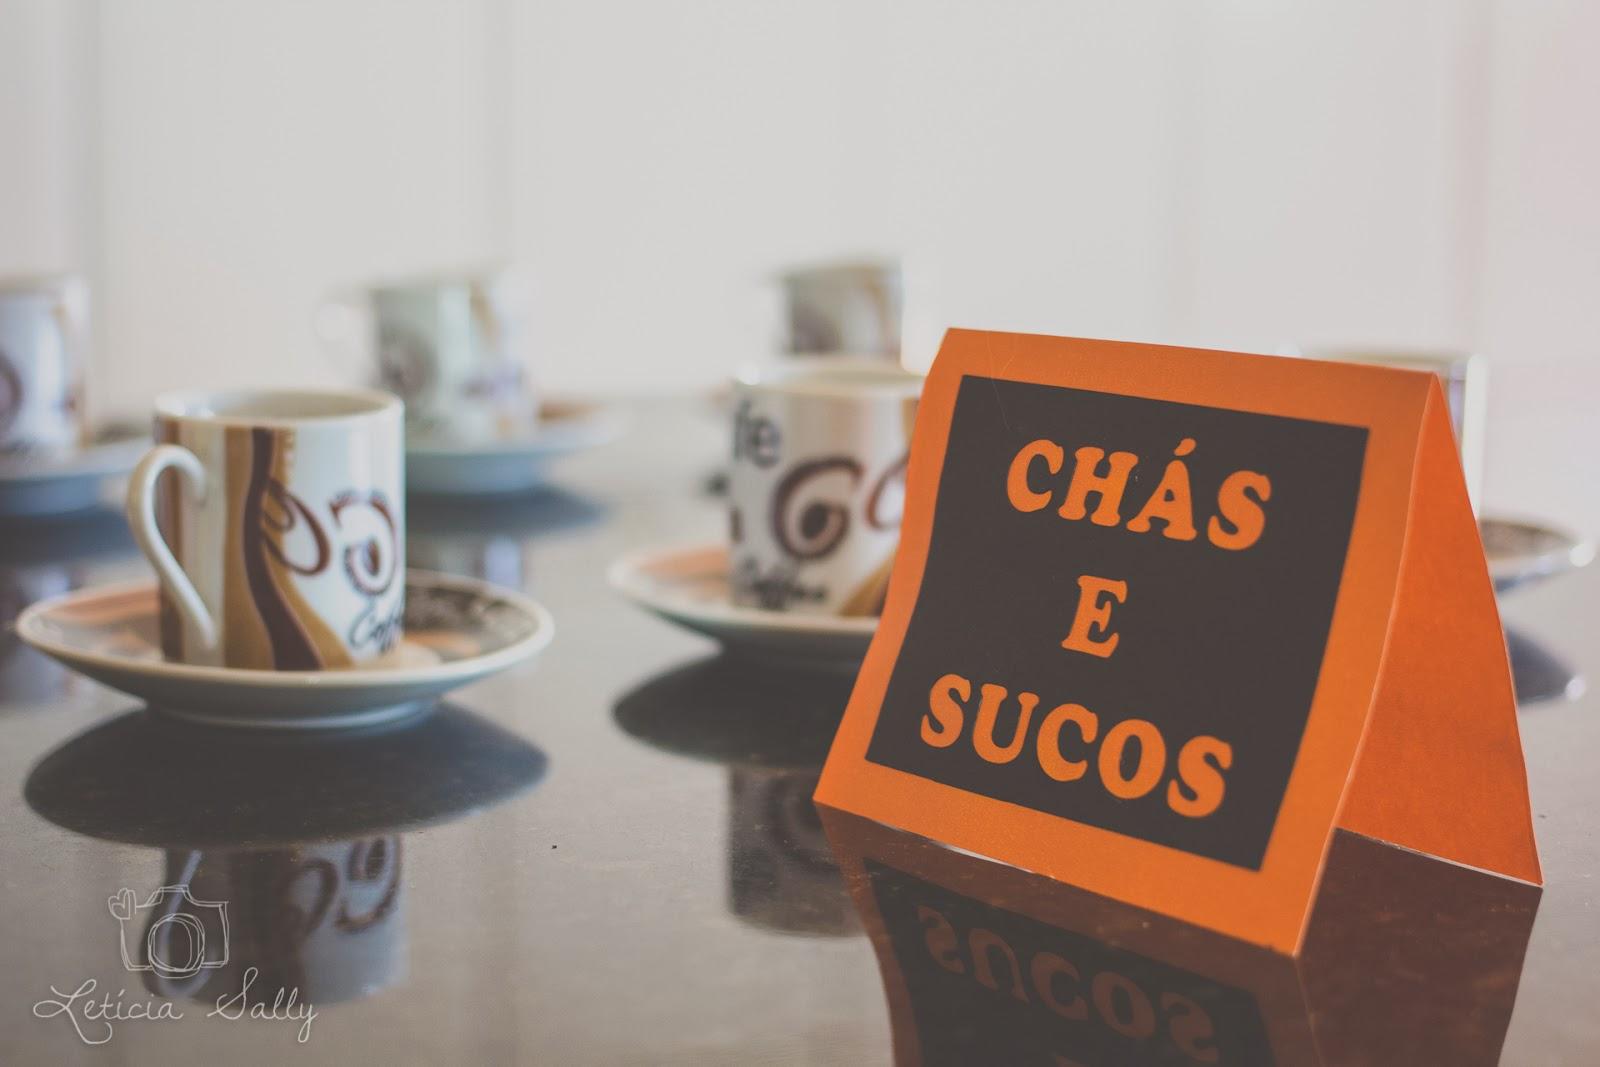 cha-panela-rustico-simples-cha